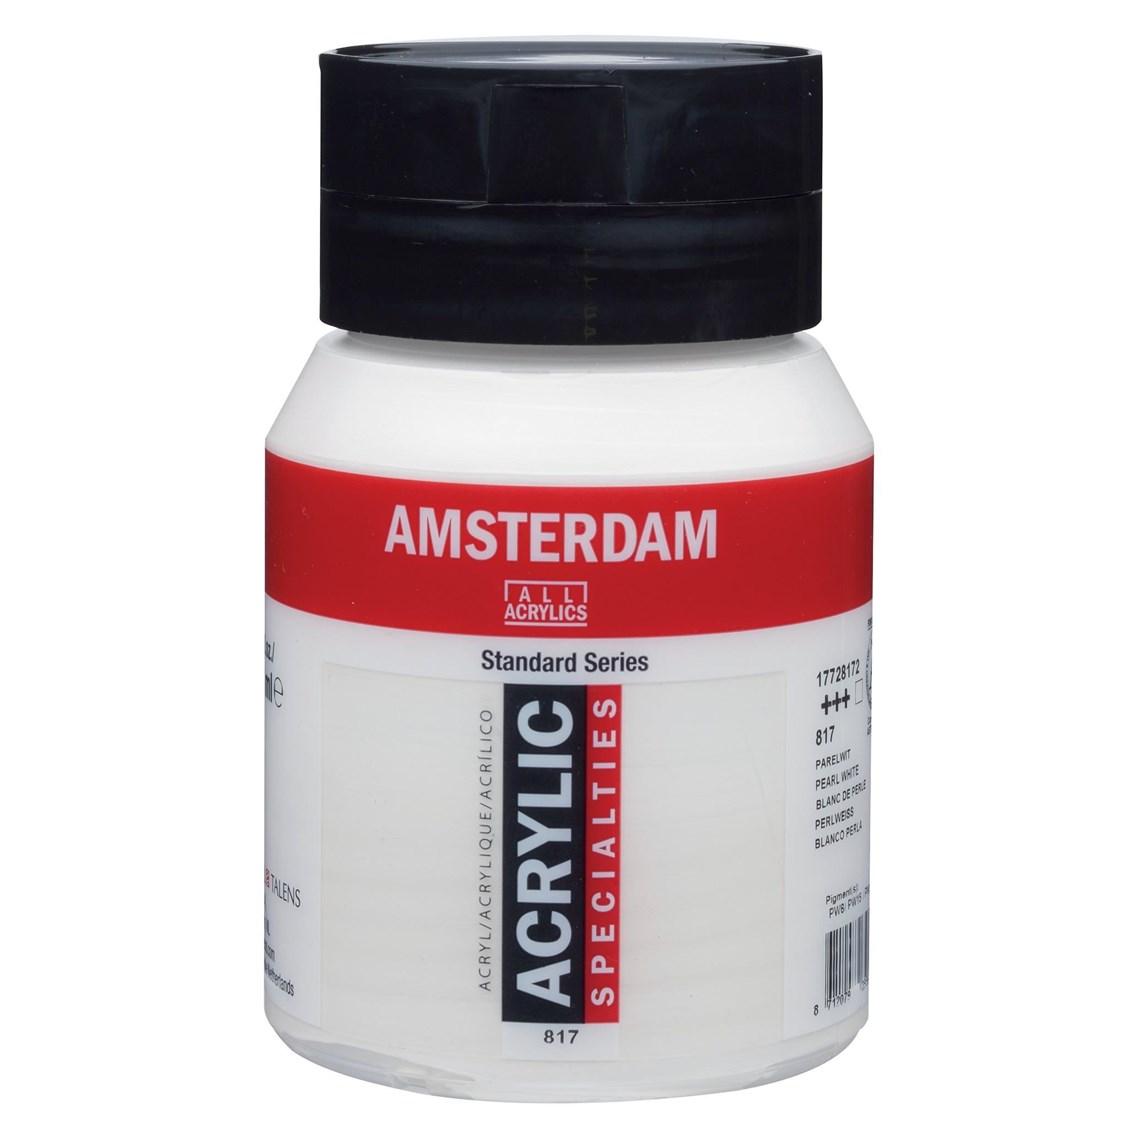 Amsterdam Acrylverf Parelwit 817 specialties Angelart Kunst en zo